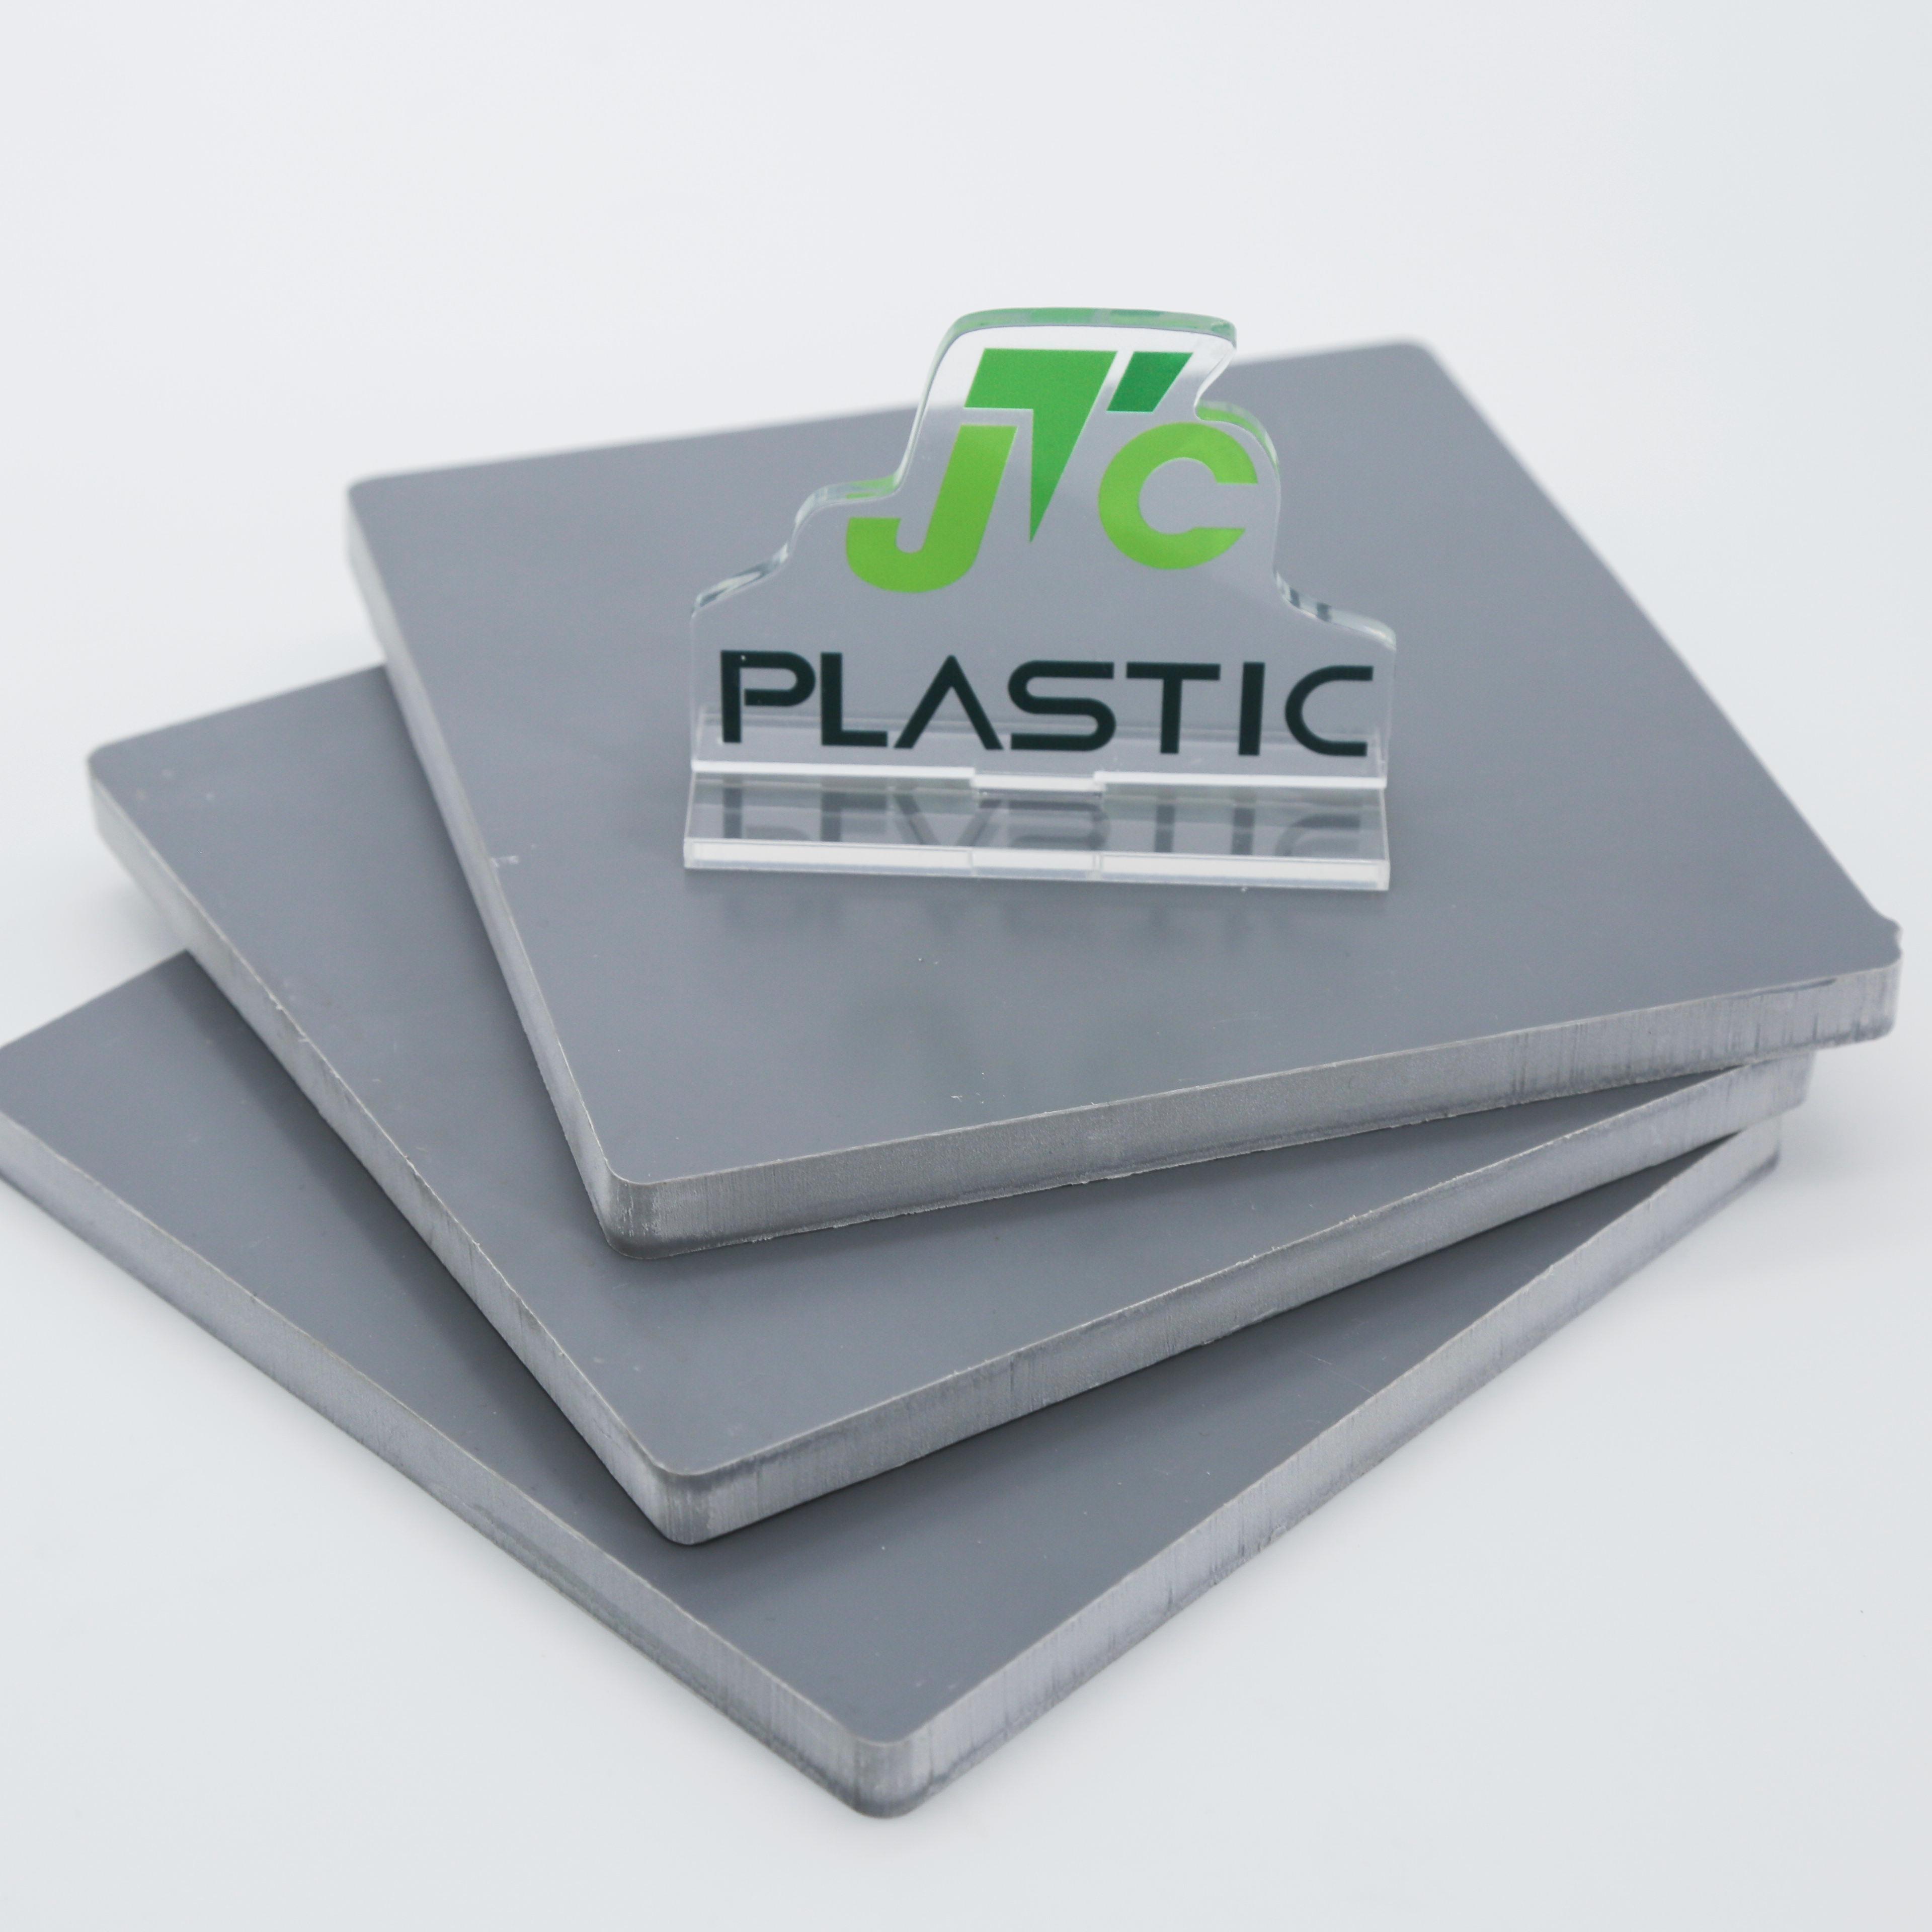 pvc板 pvc板生产厂家  pvc塑料板  pvc板材